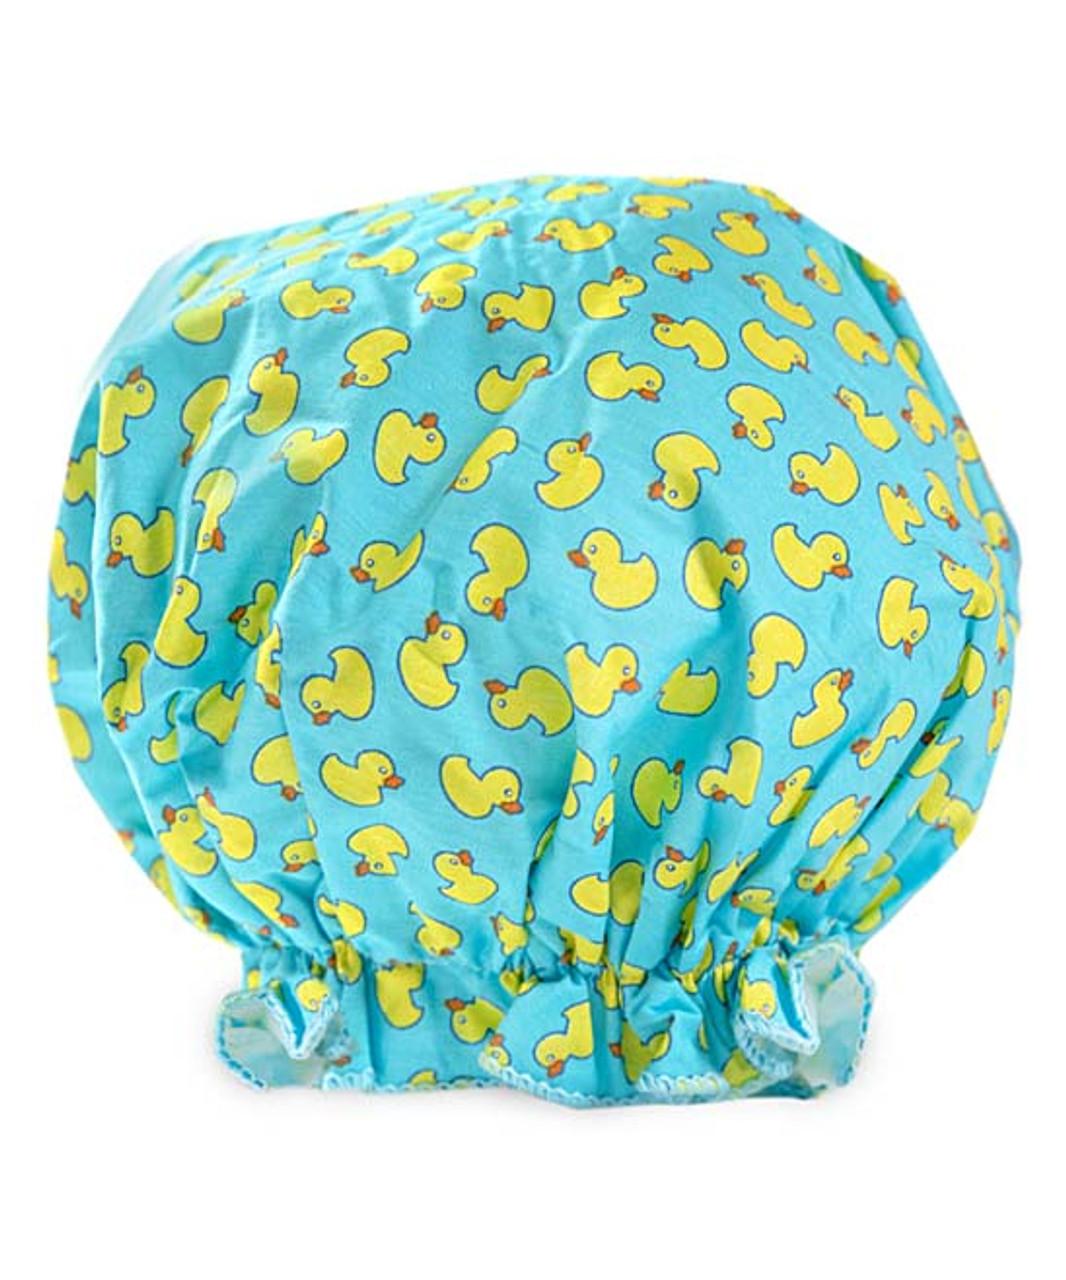 Shower Cap Pattern : shower, pattern, Bouffant, Rubber, Shower, Vintage, Cotton, Sisters